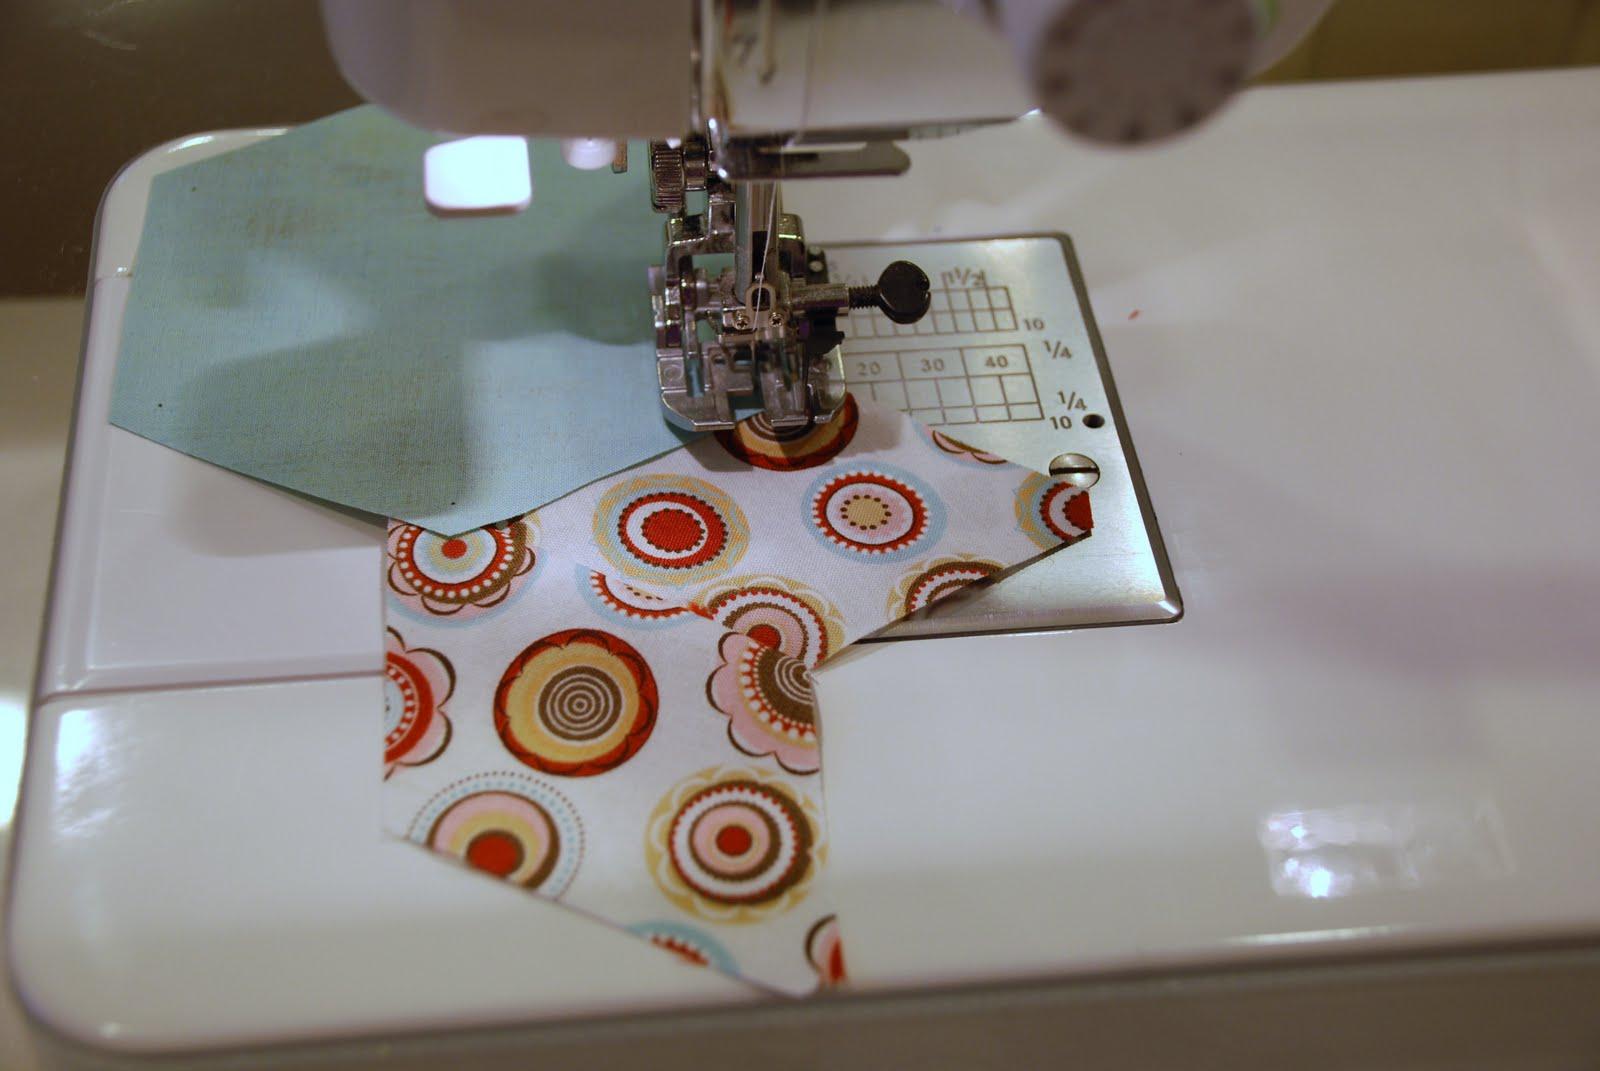 http://1.bp.blogspot.com/_JzsD4GHzGks/TE9dLr2VdCI/AAAAAAAAFFI/V7auD5r7SIo/s1600/machine+sew+along+10.JPG